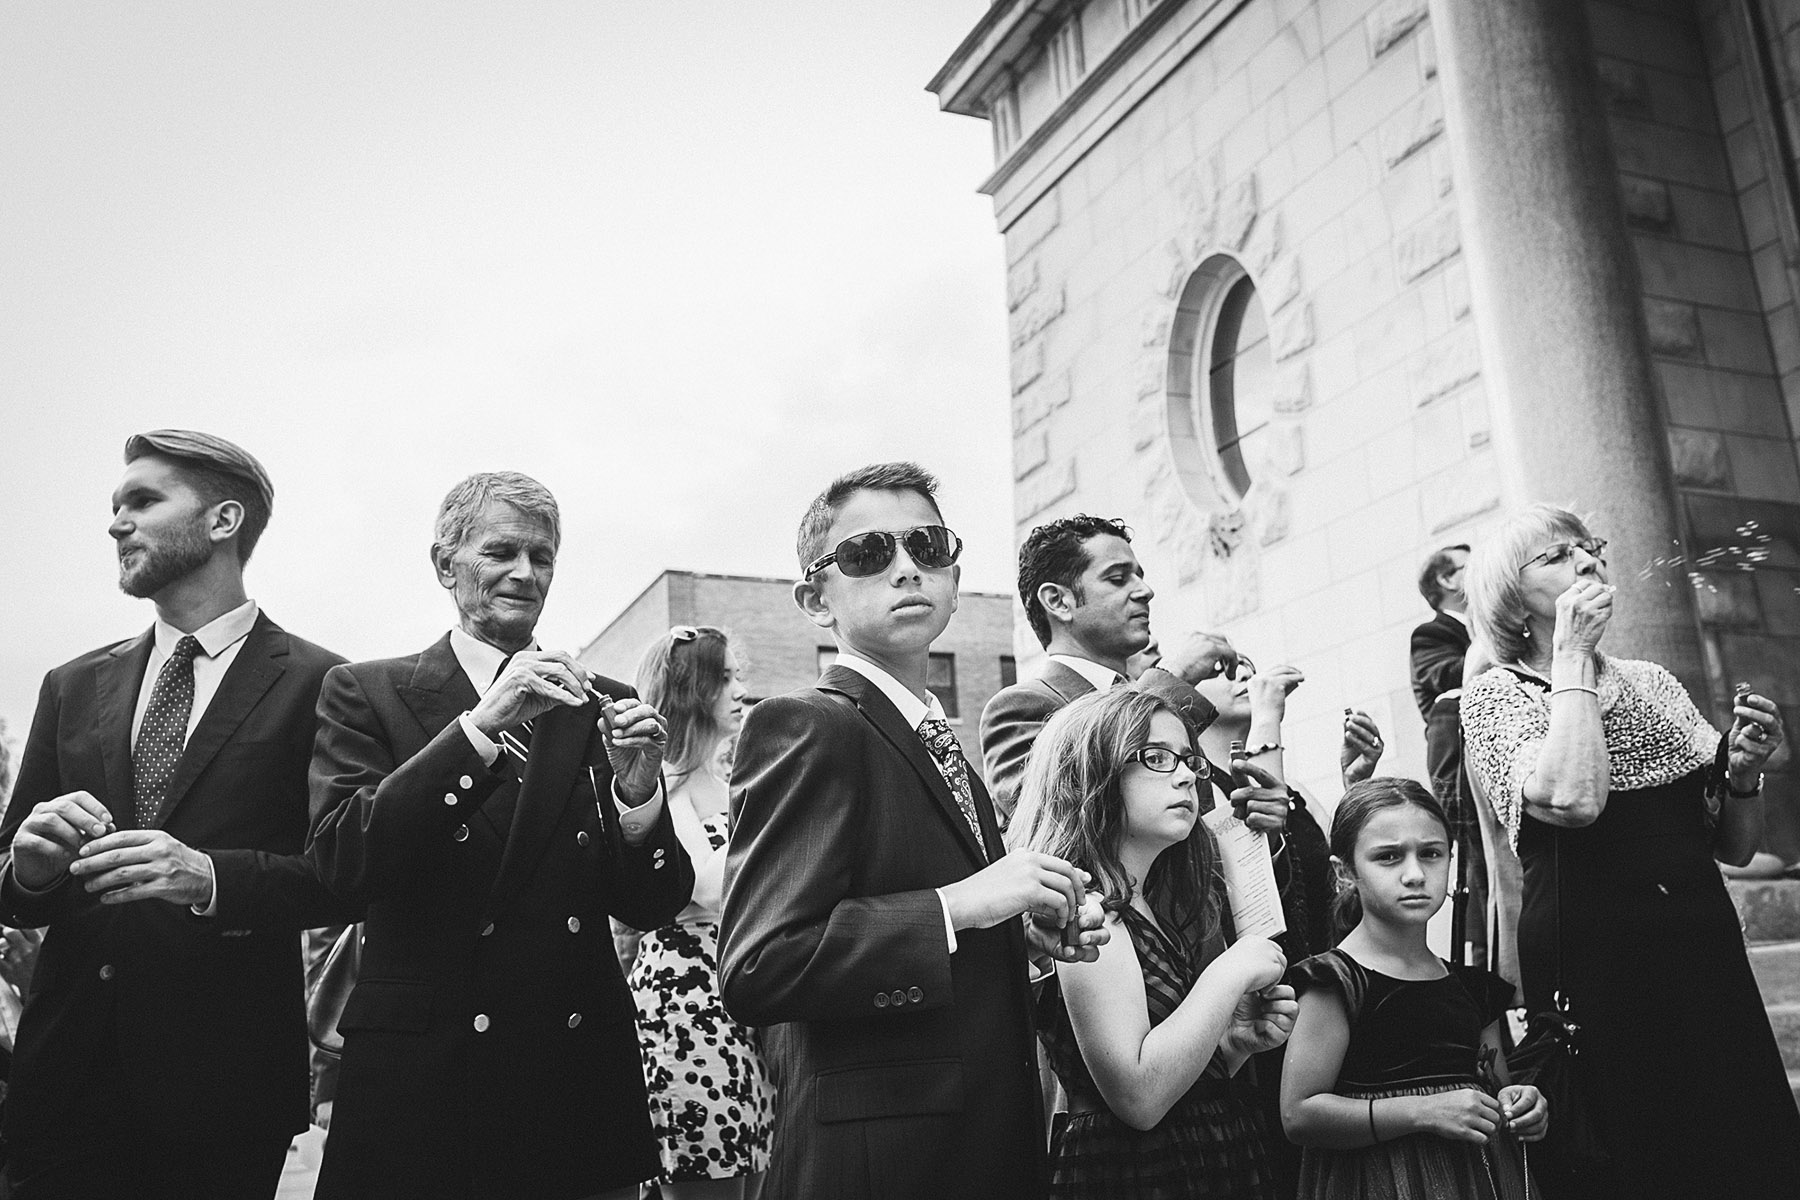 st-hegwig-chicago-urban-arts-society-terrarium-inspired-wedding-documentary-wedding-photography-oriana-koren-23.jpg